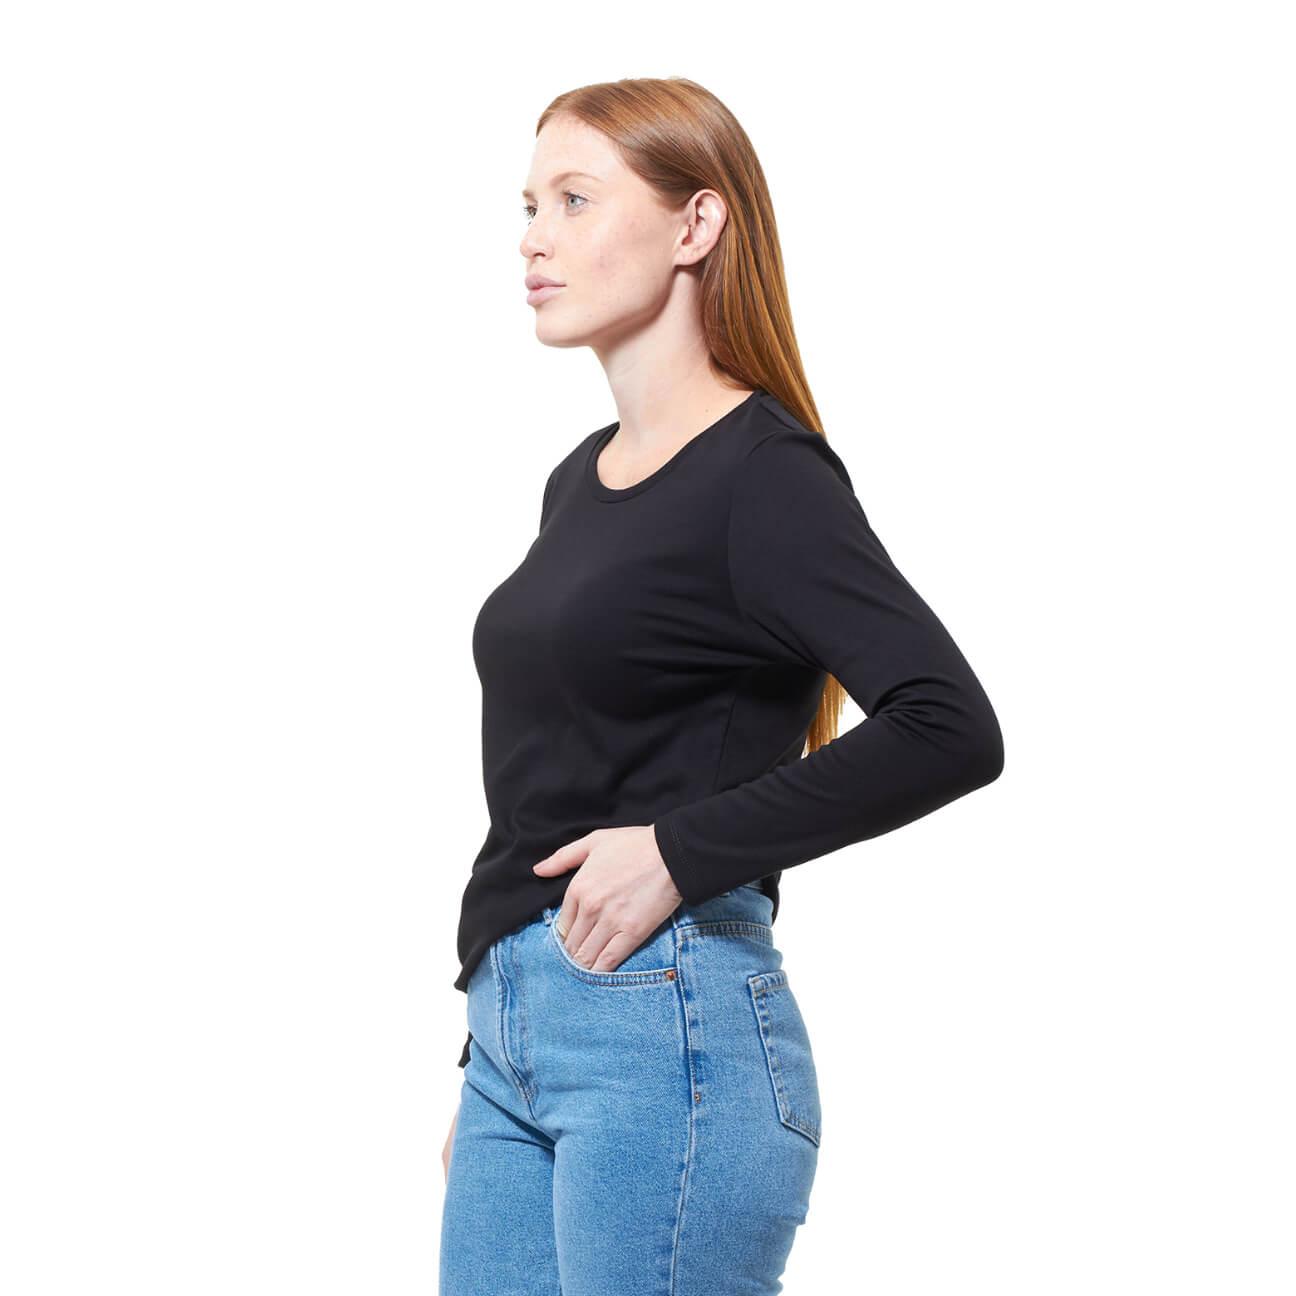 Franela basica dama manga larga negra lado